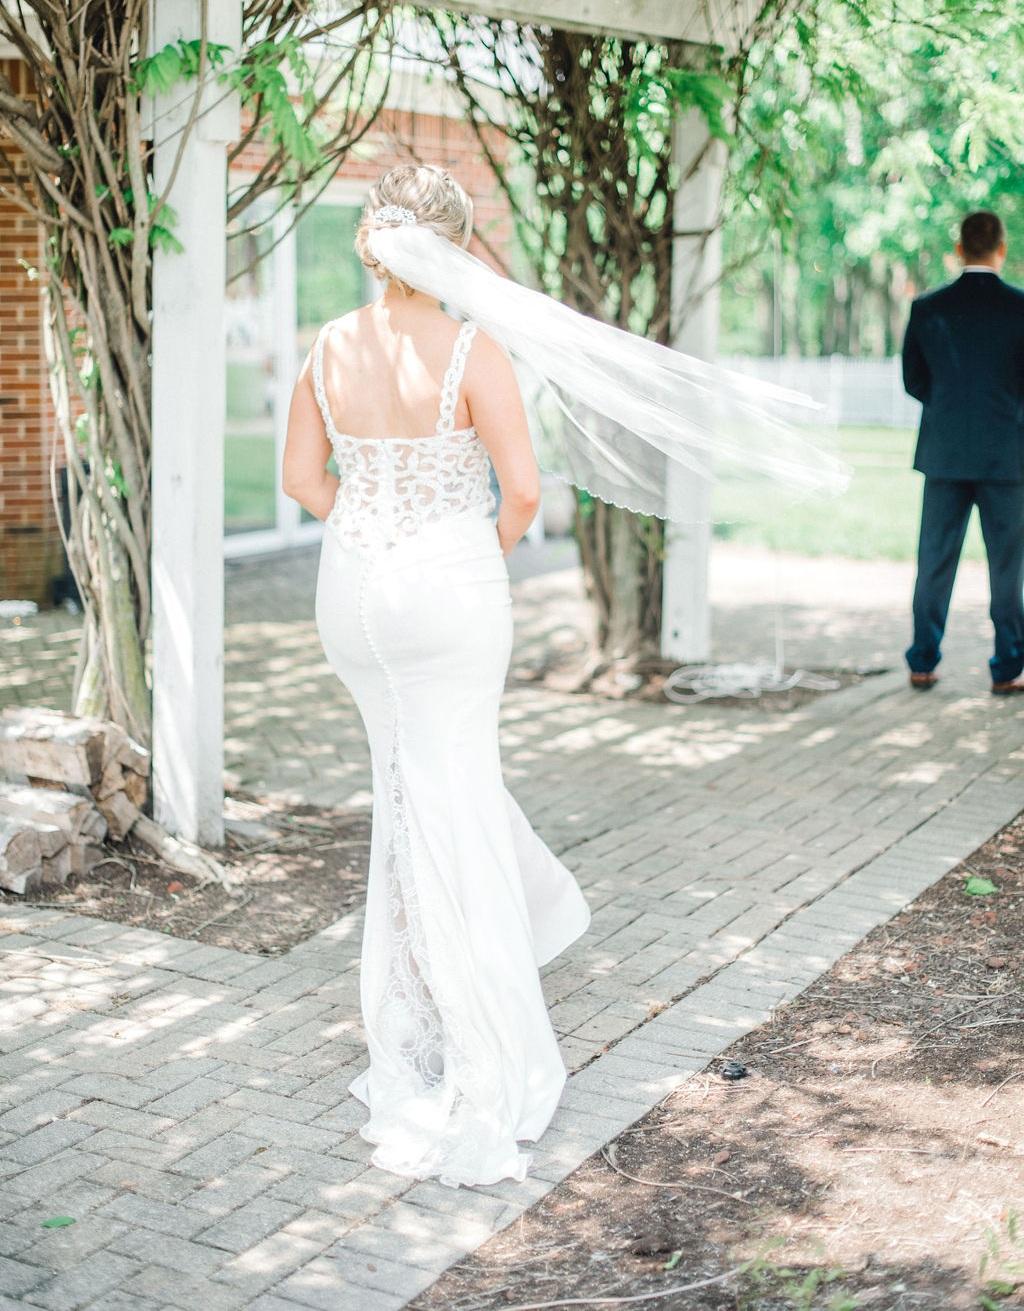 Dayton-wedding-planner-first-look-bride-and-groom